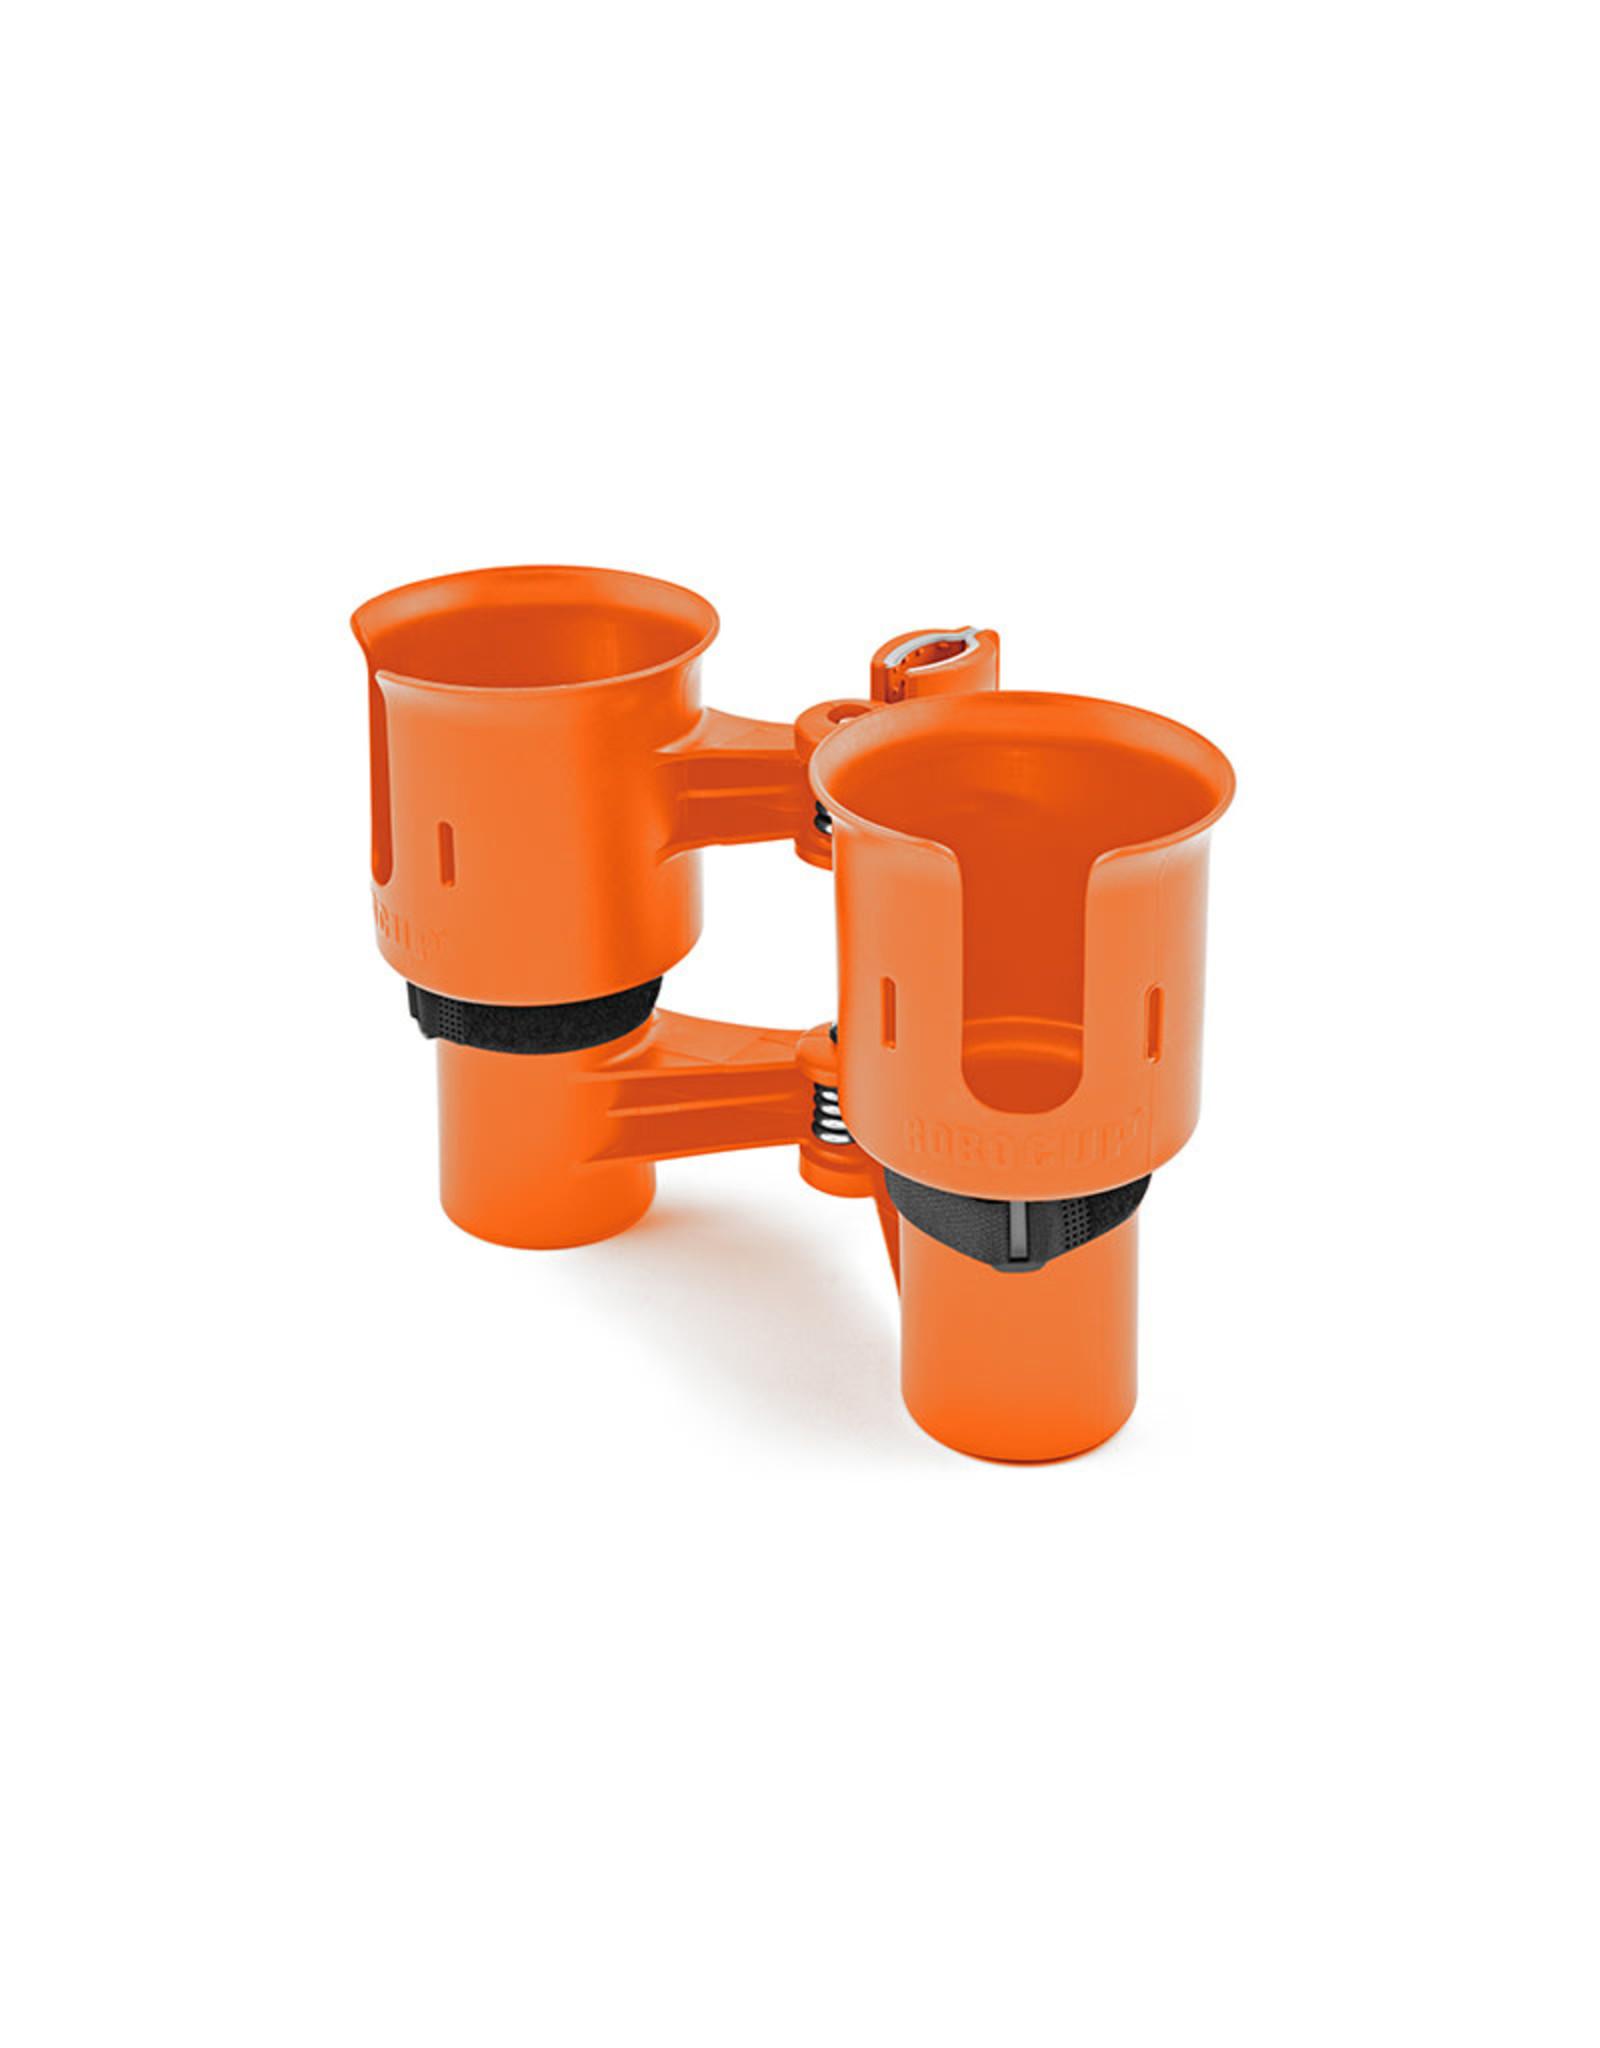 Inovativ Inovativ Robo Cup